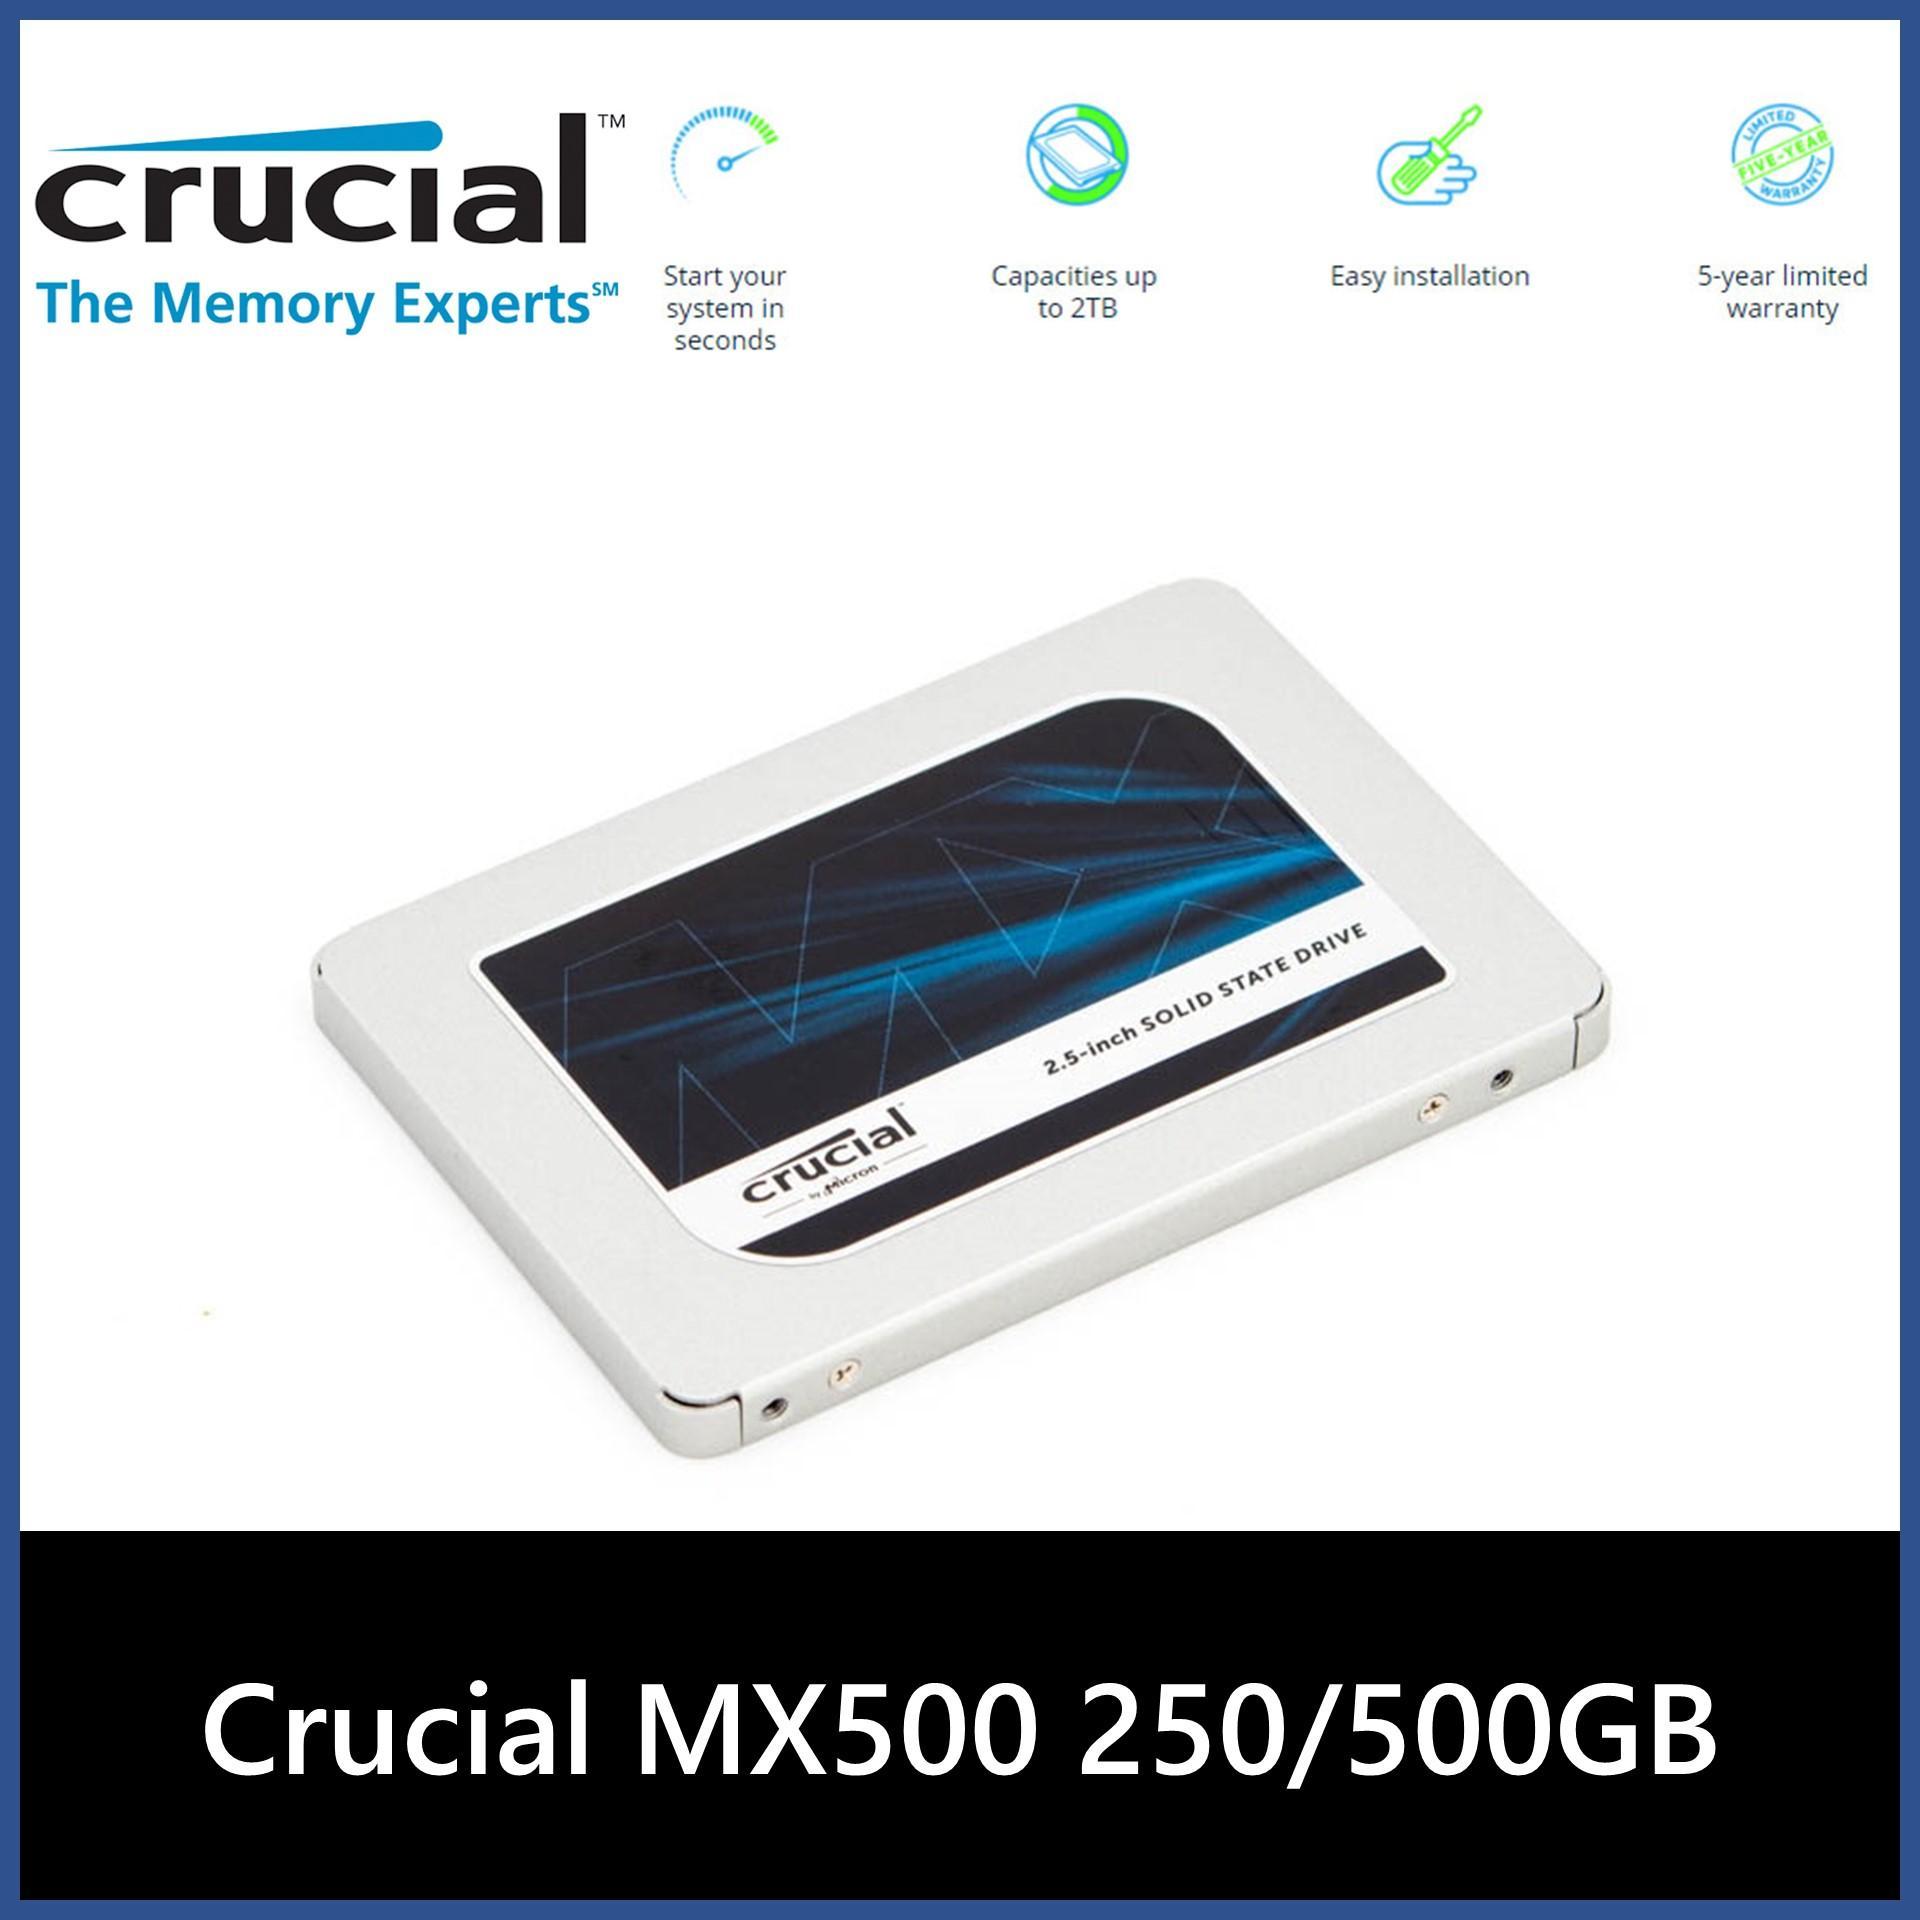 Crucial MX500 250GB/500GB/1TB SATA 2.5 Inch Internal Solid State Drive